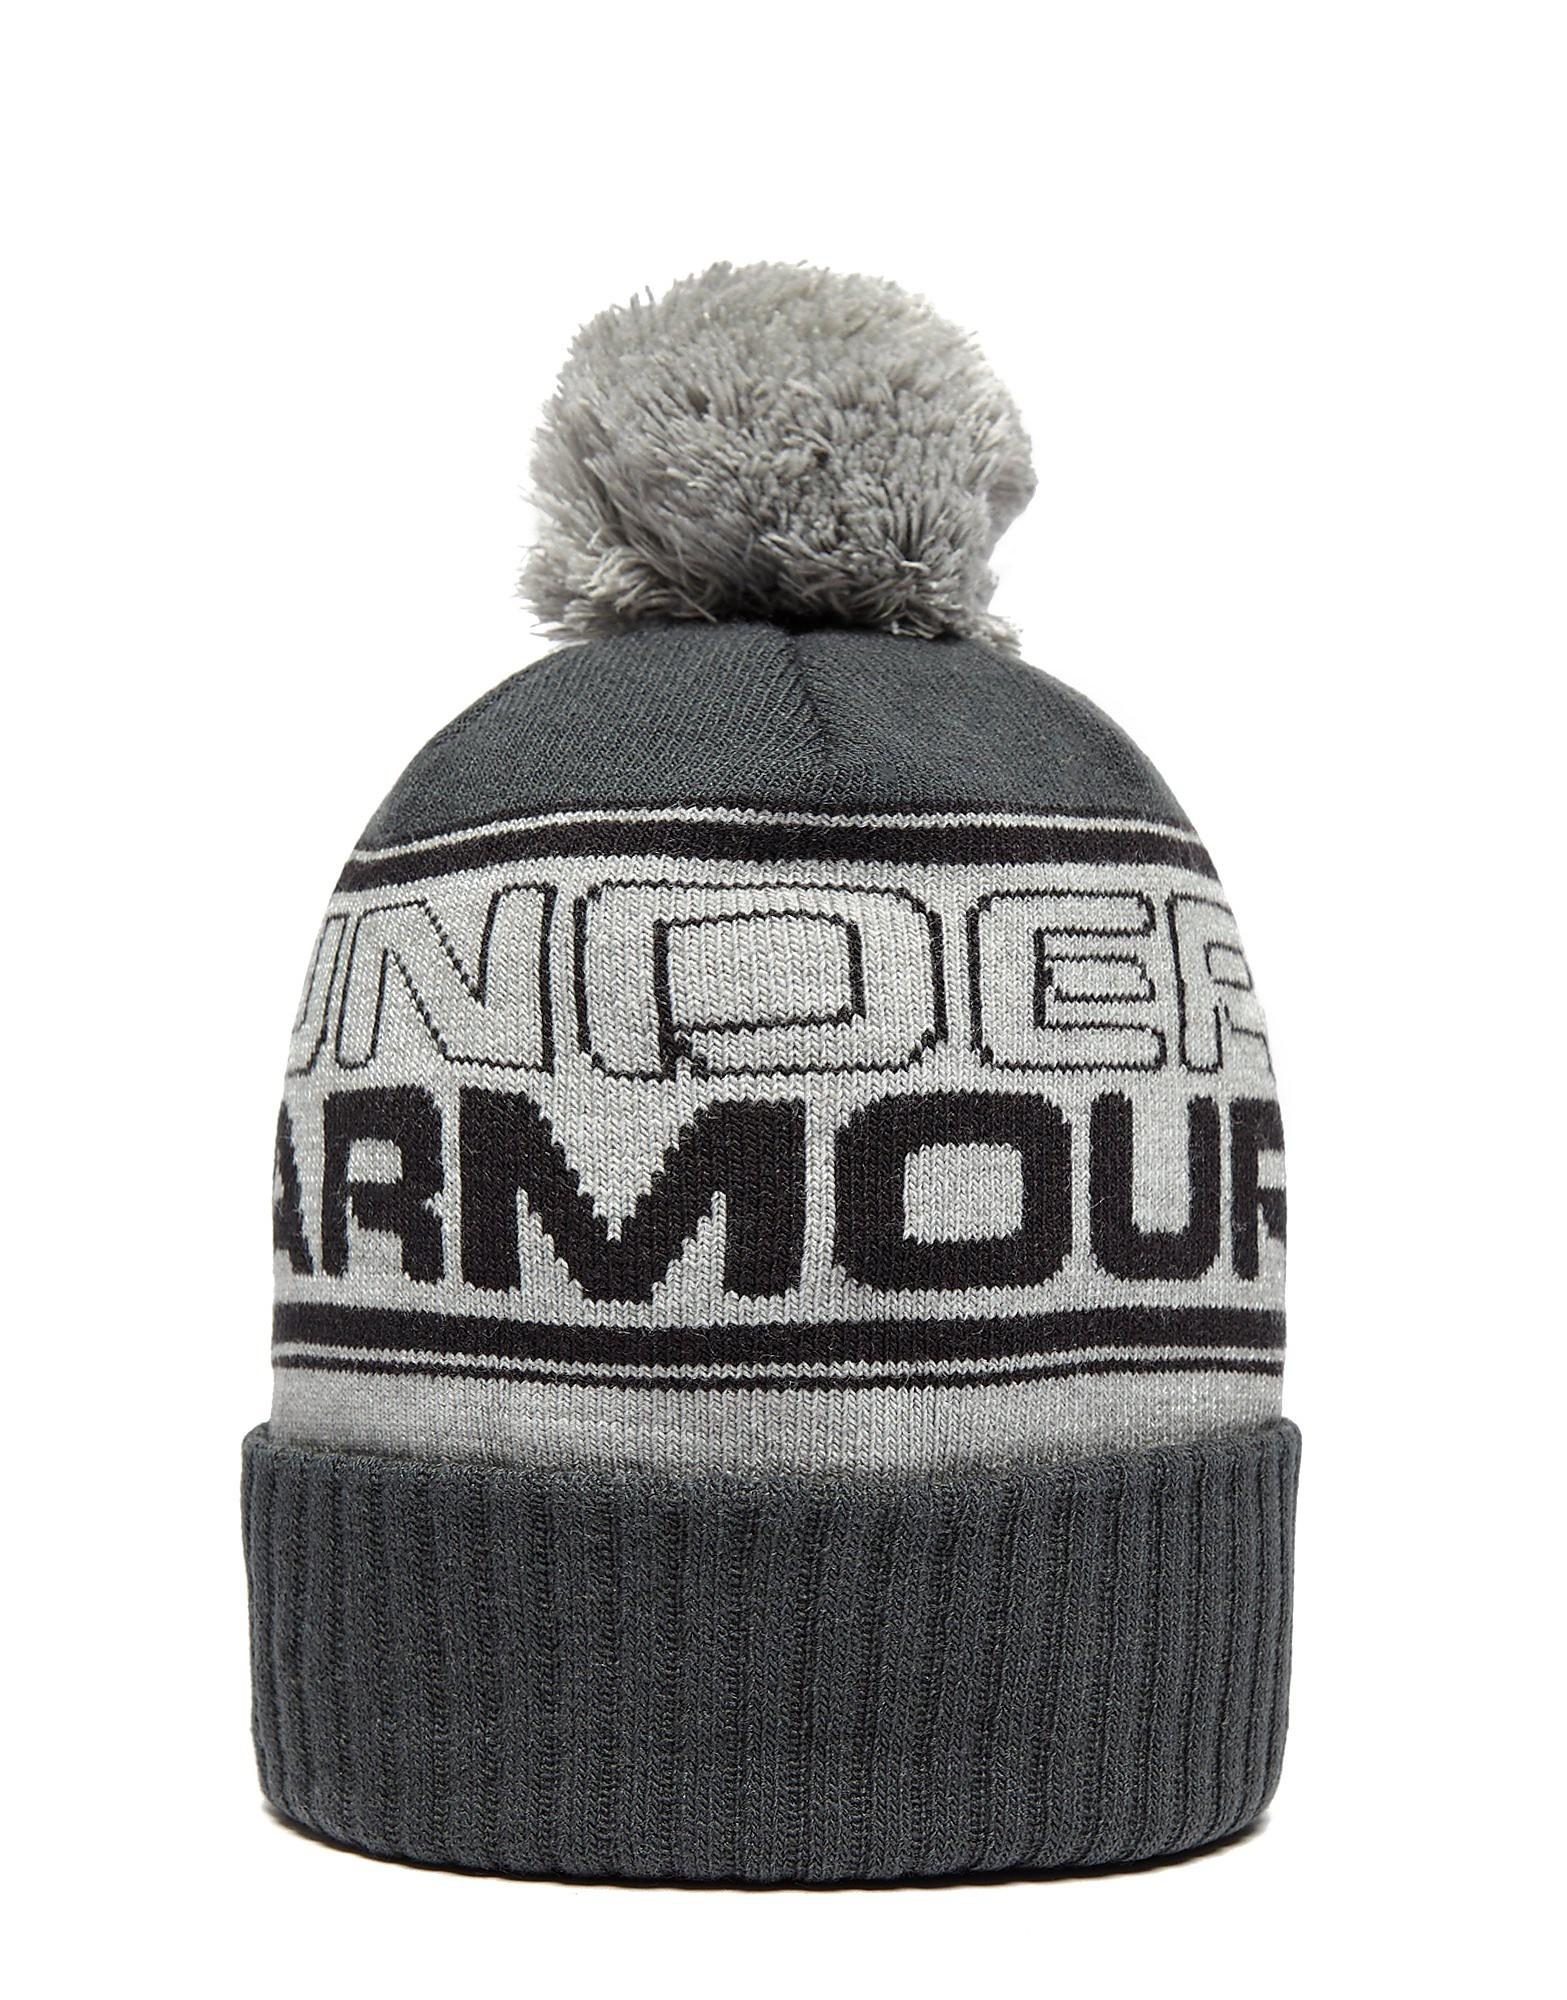 Under Armour Retro Pom Beanie Hat